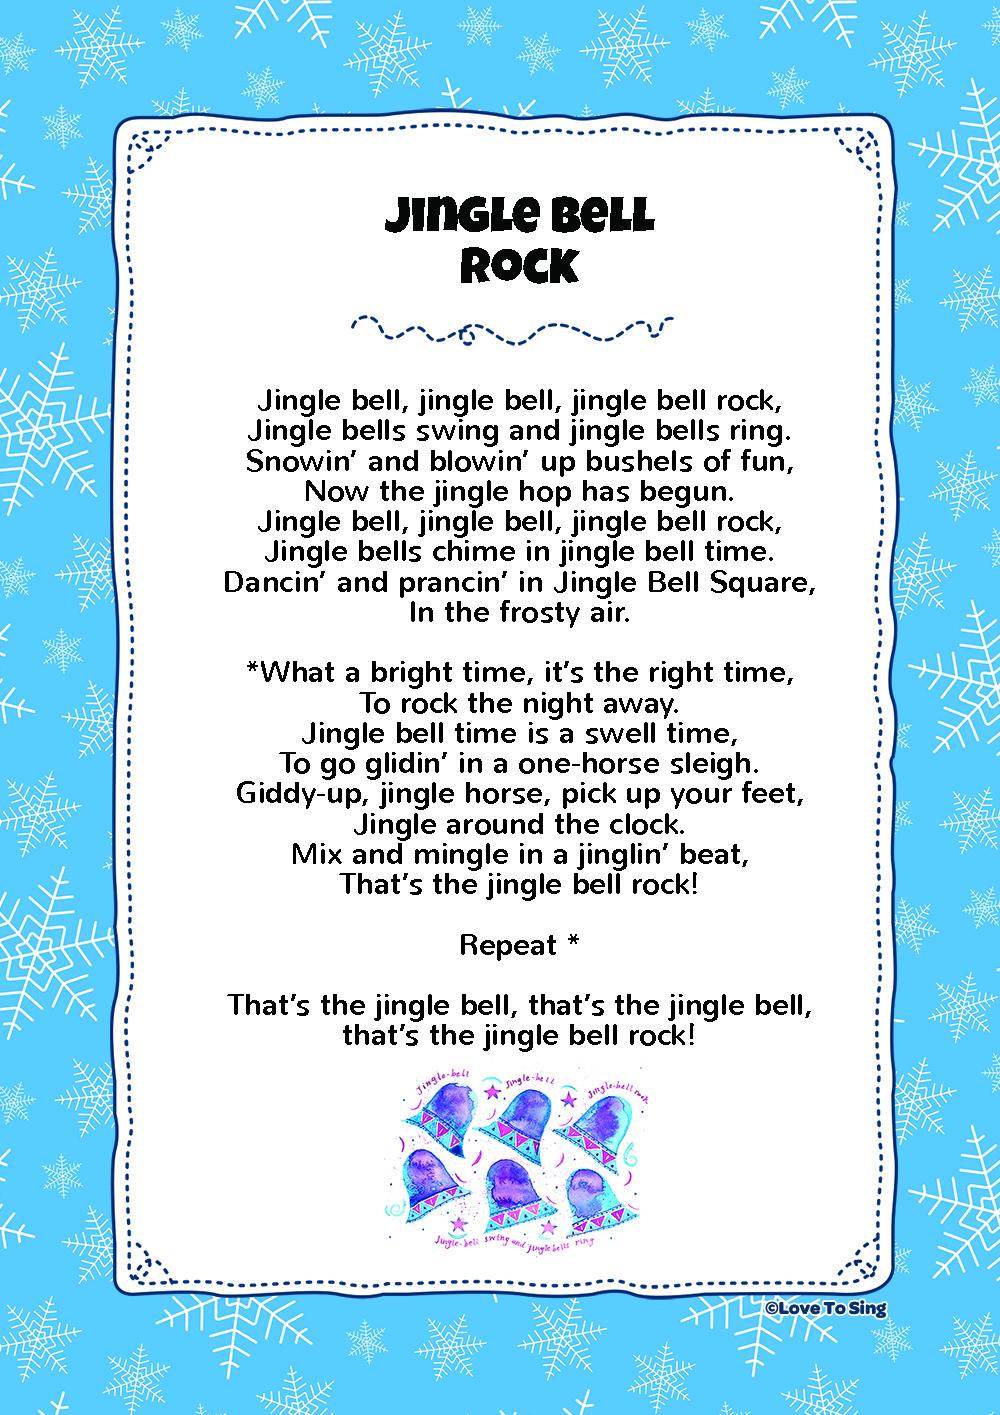 Jingle Bell Rock | Kids Video Song with FREE Lyrics & Activities!